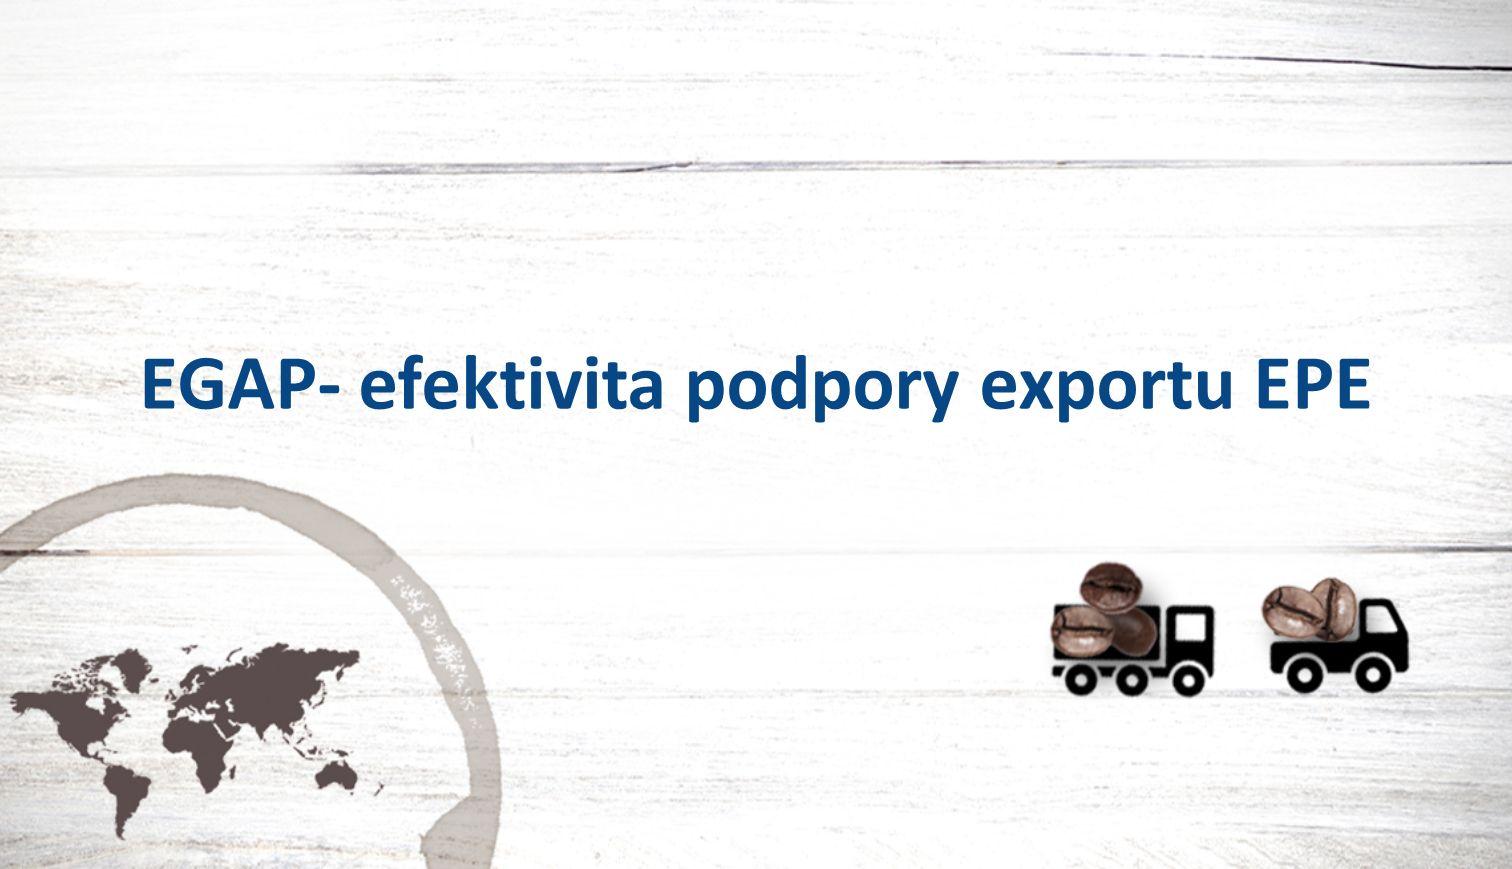 EGAP- efektivita podpory exportu EPE